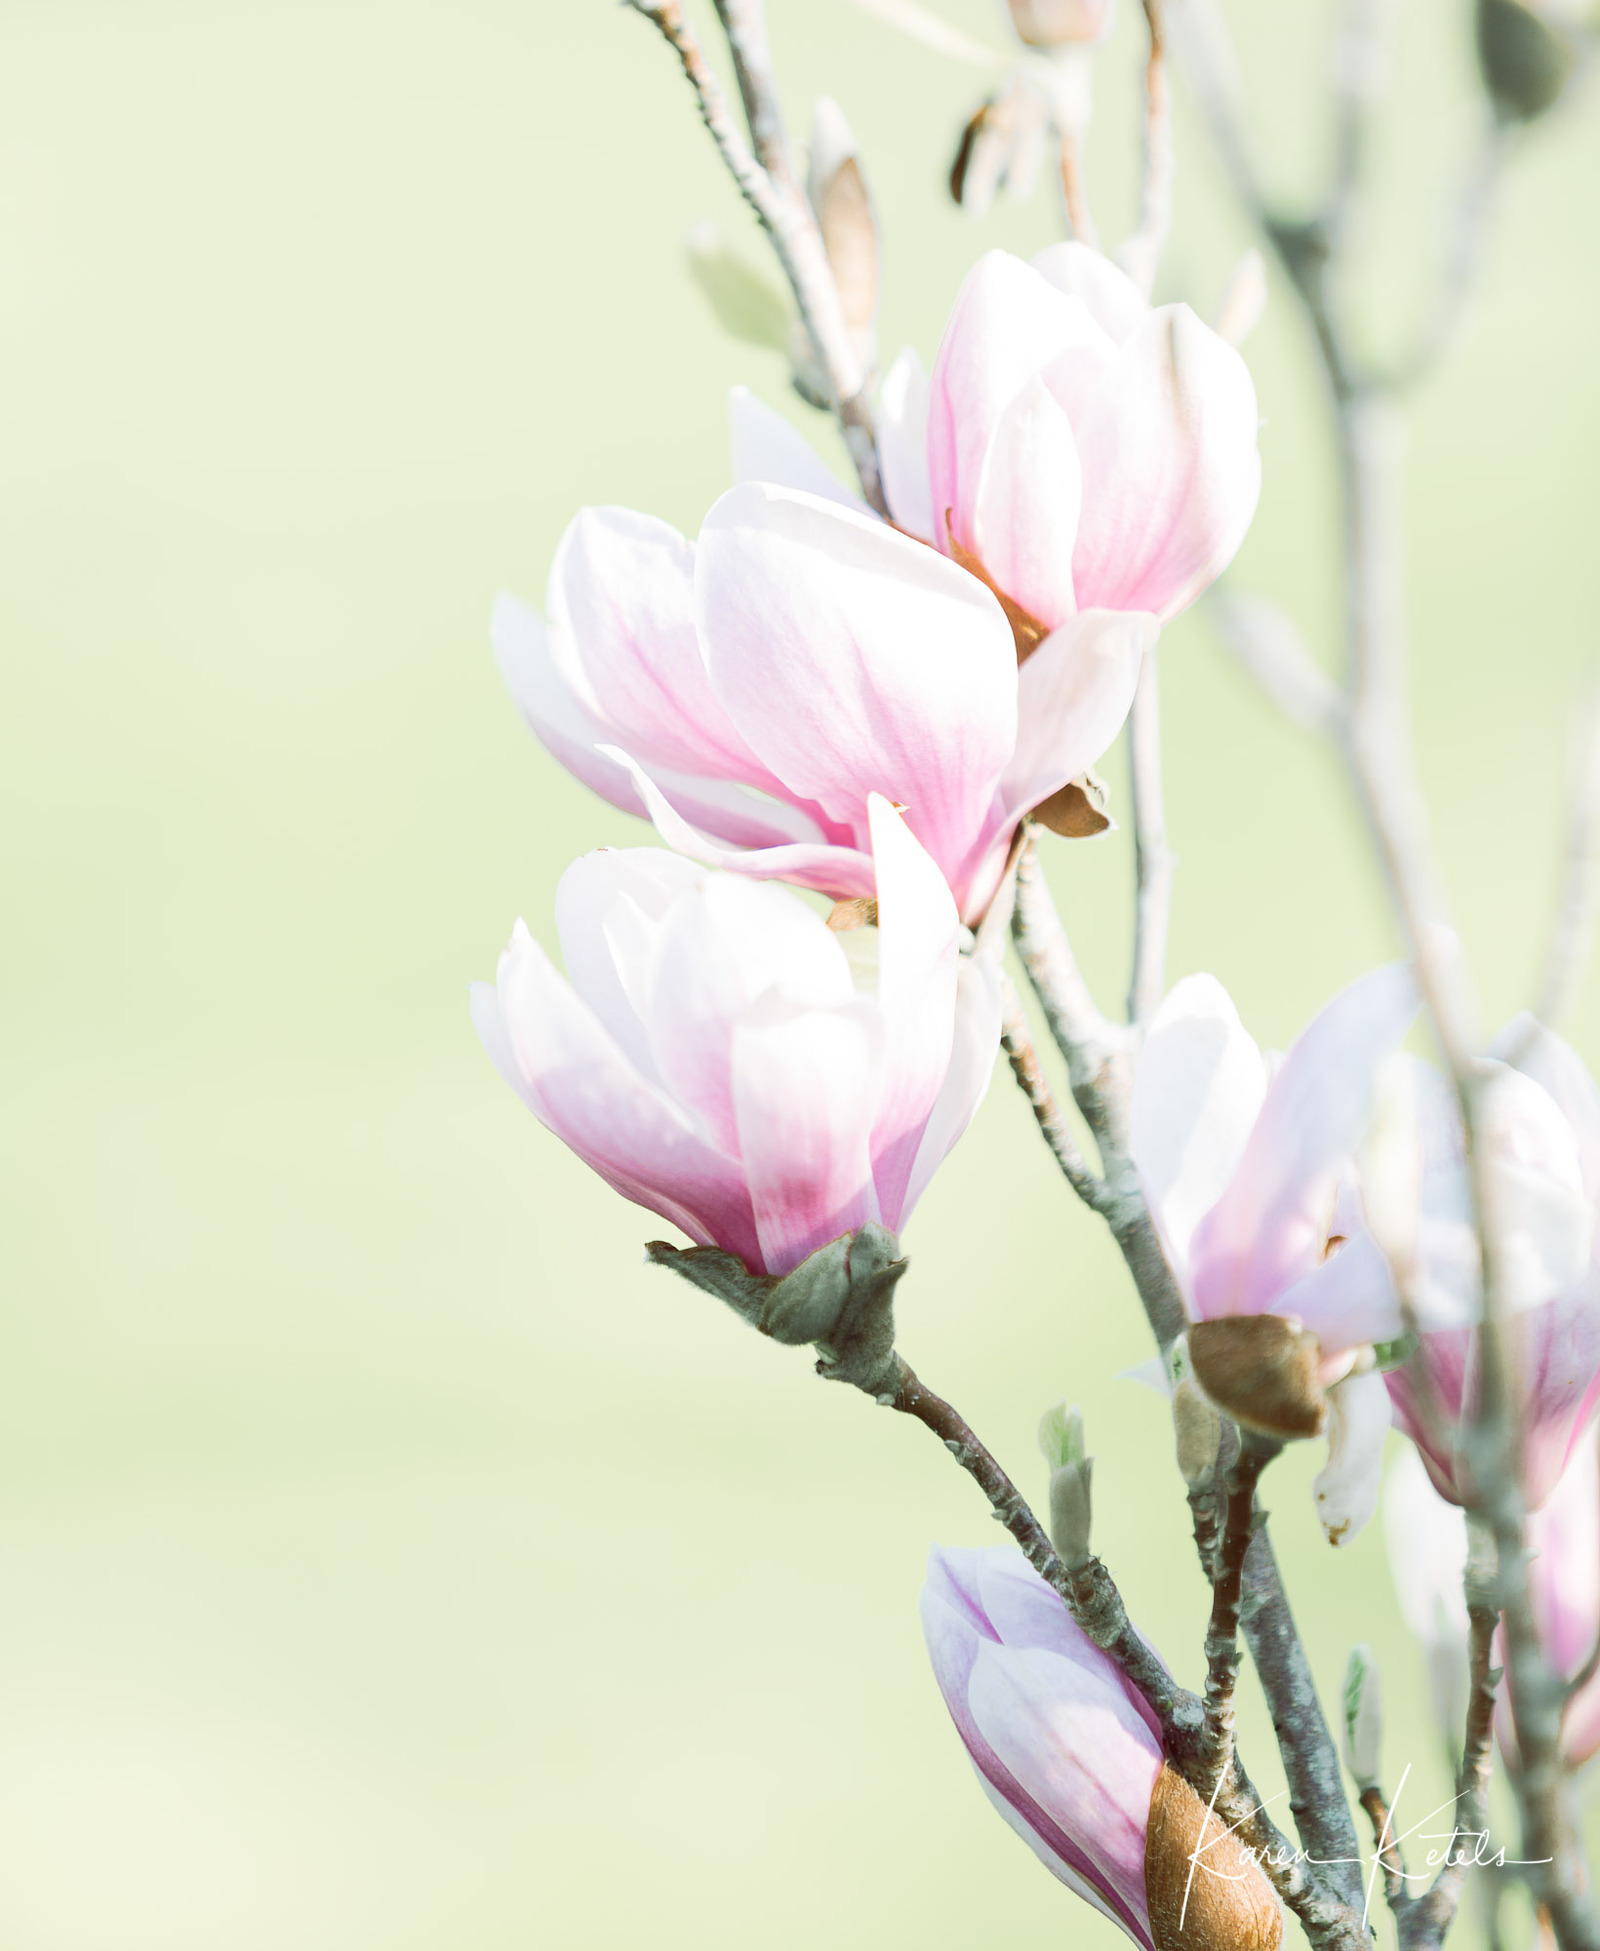 Fine Art image of magnoliaflowers by Karen Ketels